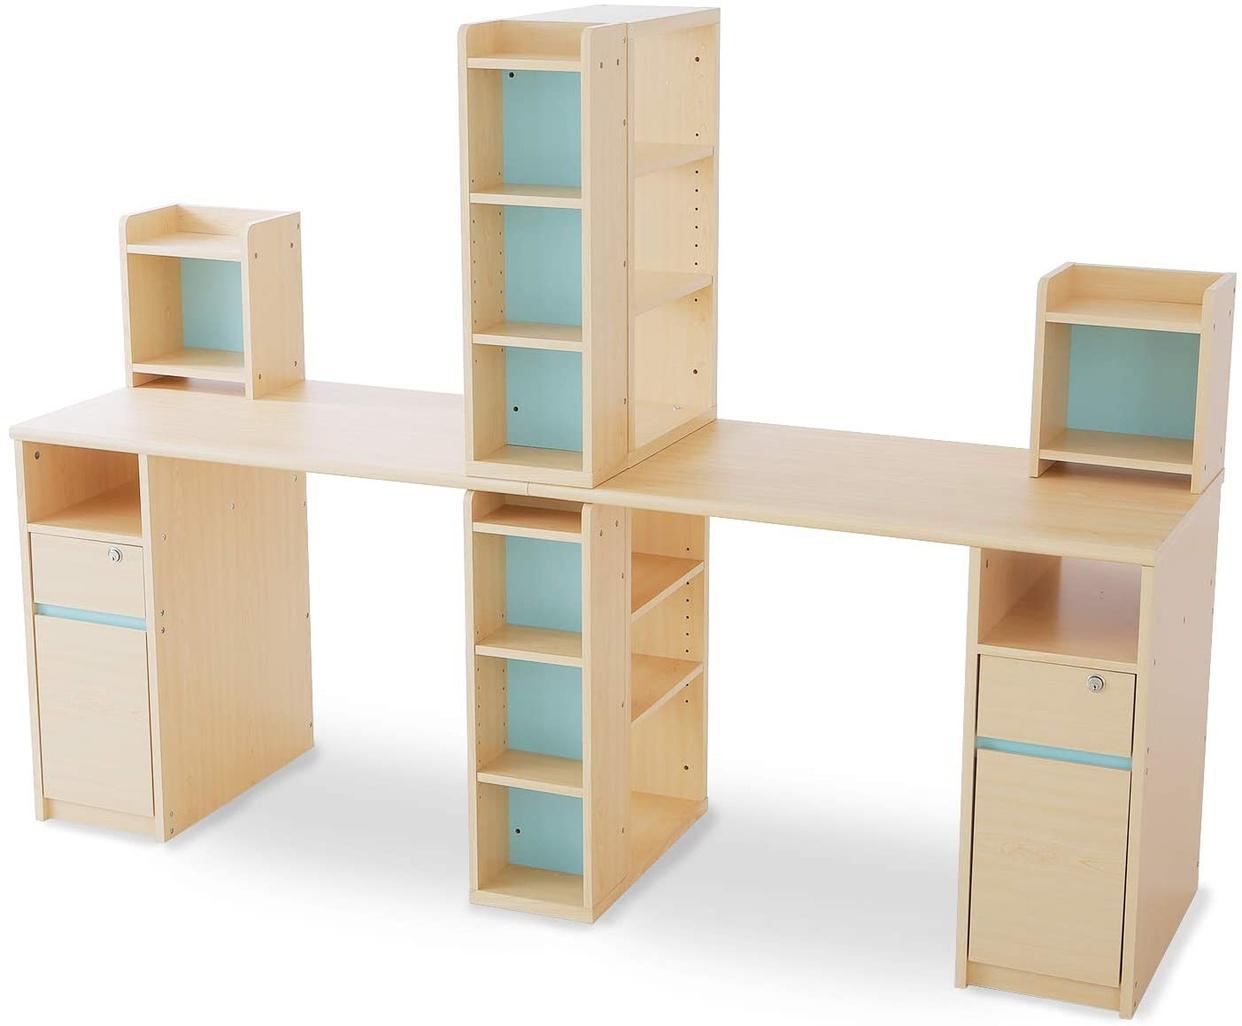 LOWYA(ロウヤ) 学習机 2人用ツインデスク 本棚・サイドラック付きの商品画像